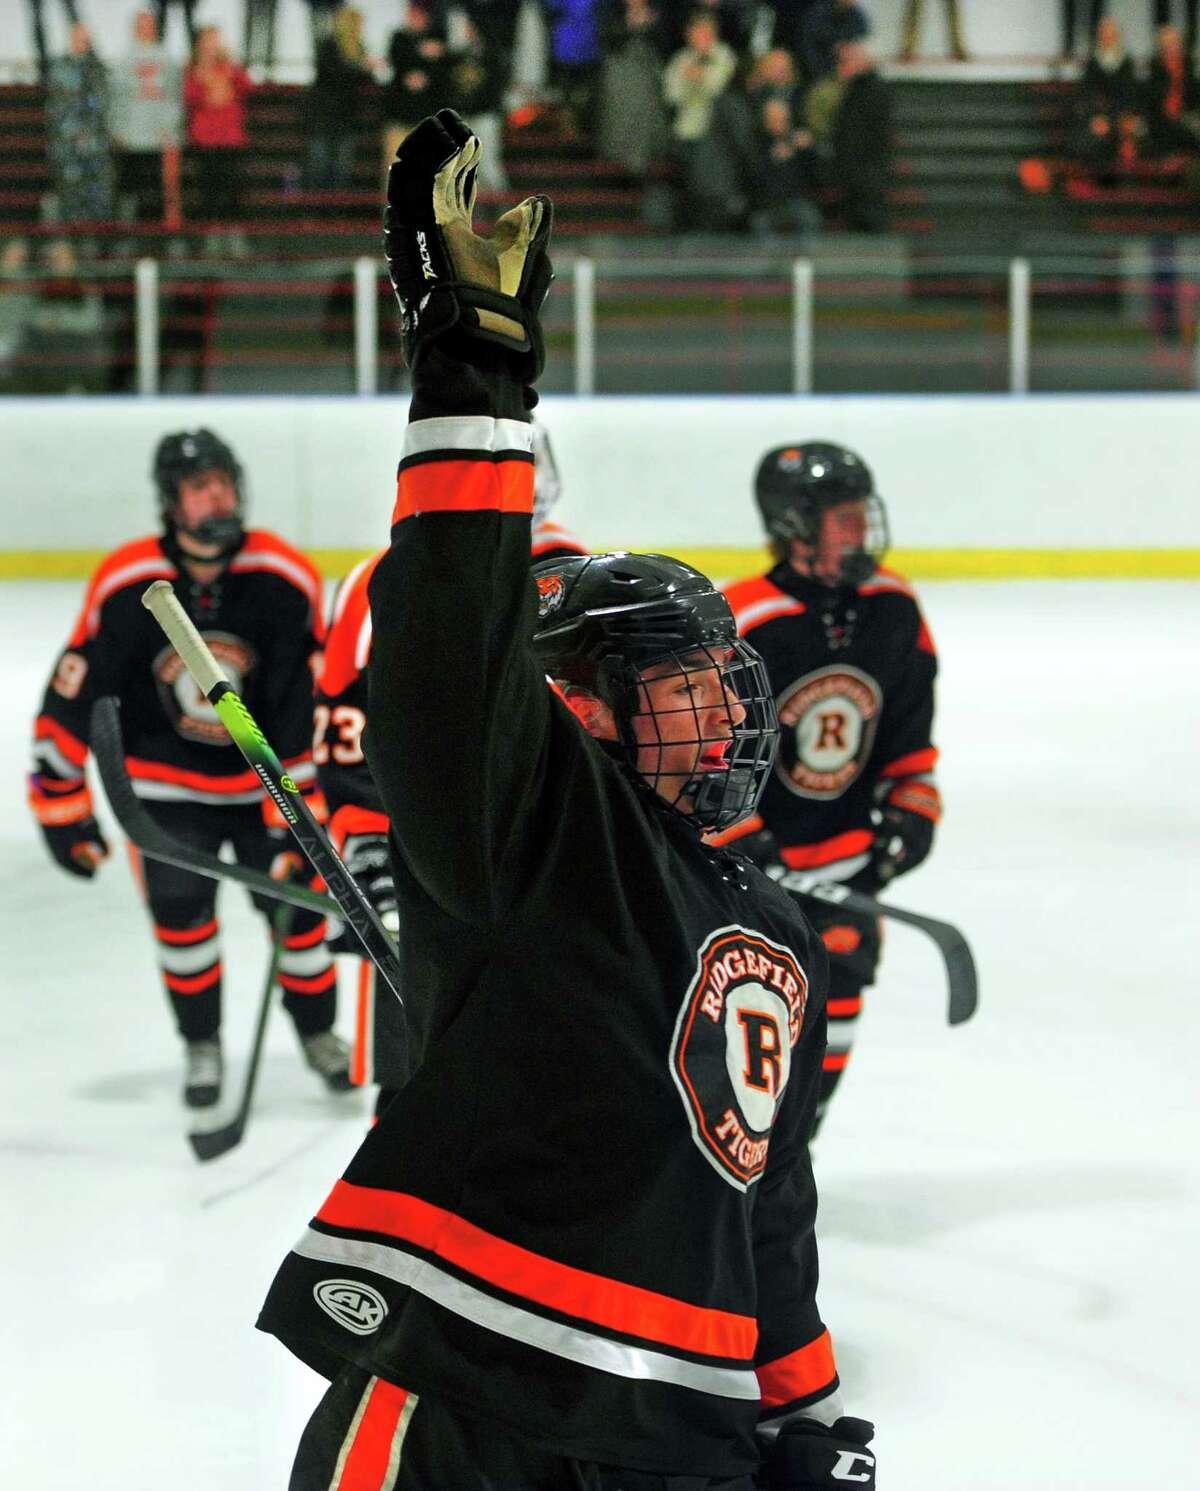 Ridgefield's Cornelius van Wees (8) celebrates his goal against Fairfield Prep during boys high school ice hockey action in Bridgeport, Conn., on Wednesday Feb. 12, 2020.